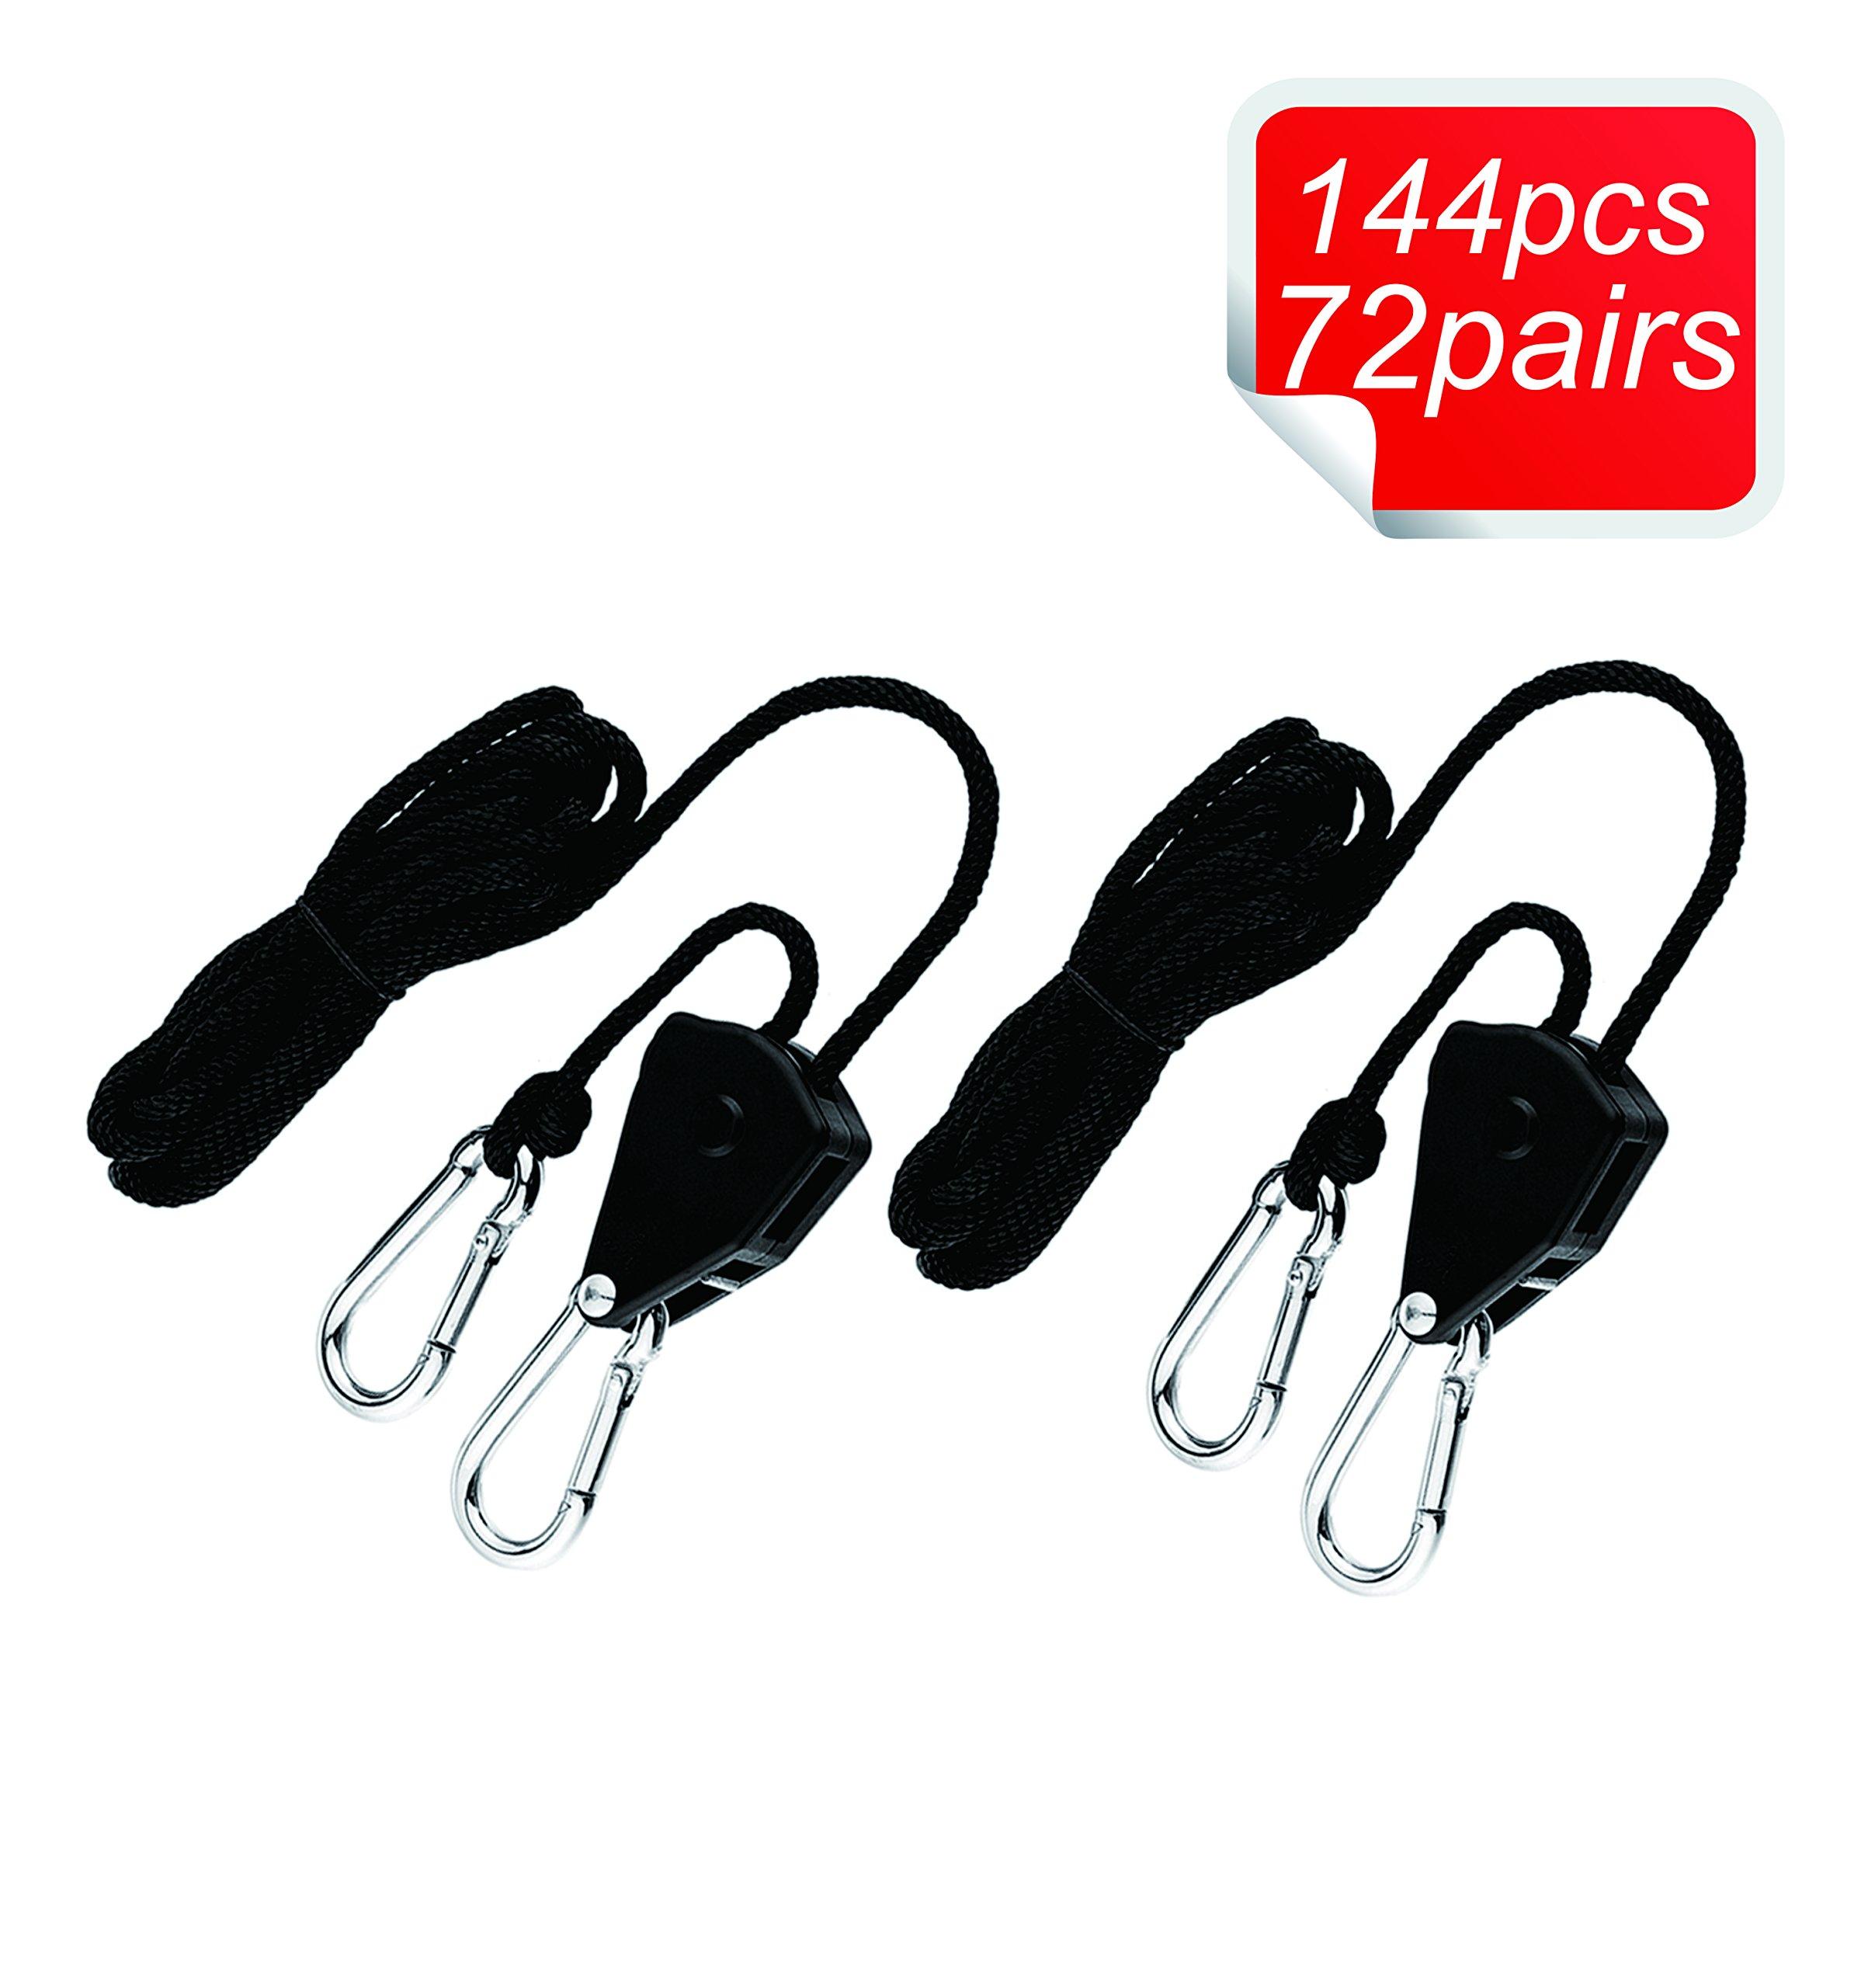 Oppolite 144PCS/72 Pairs1/8'' 150lb Grow Light Rope Ratchet Hangers Heavy Duty Adjustable Clip Grow Light Reflectors Hangers, 150lb Capacity